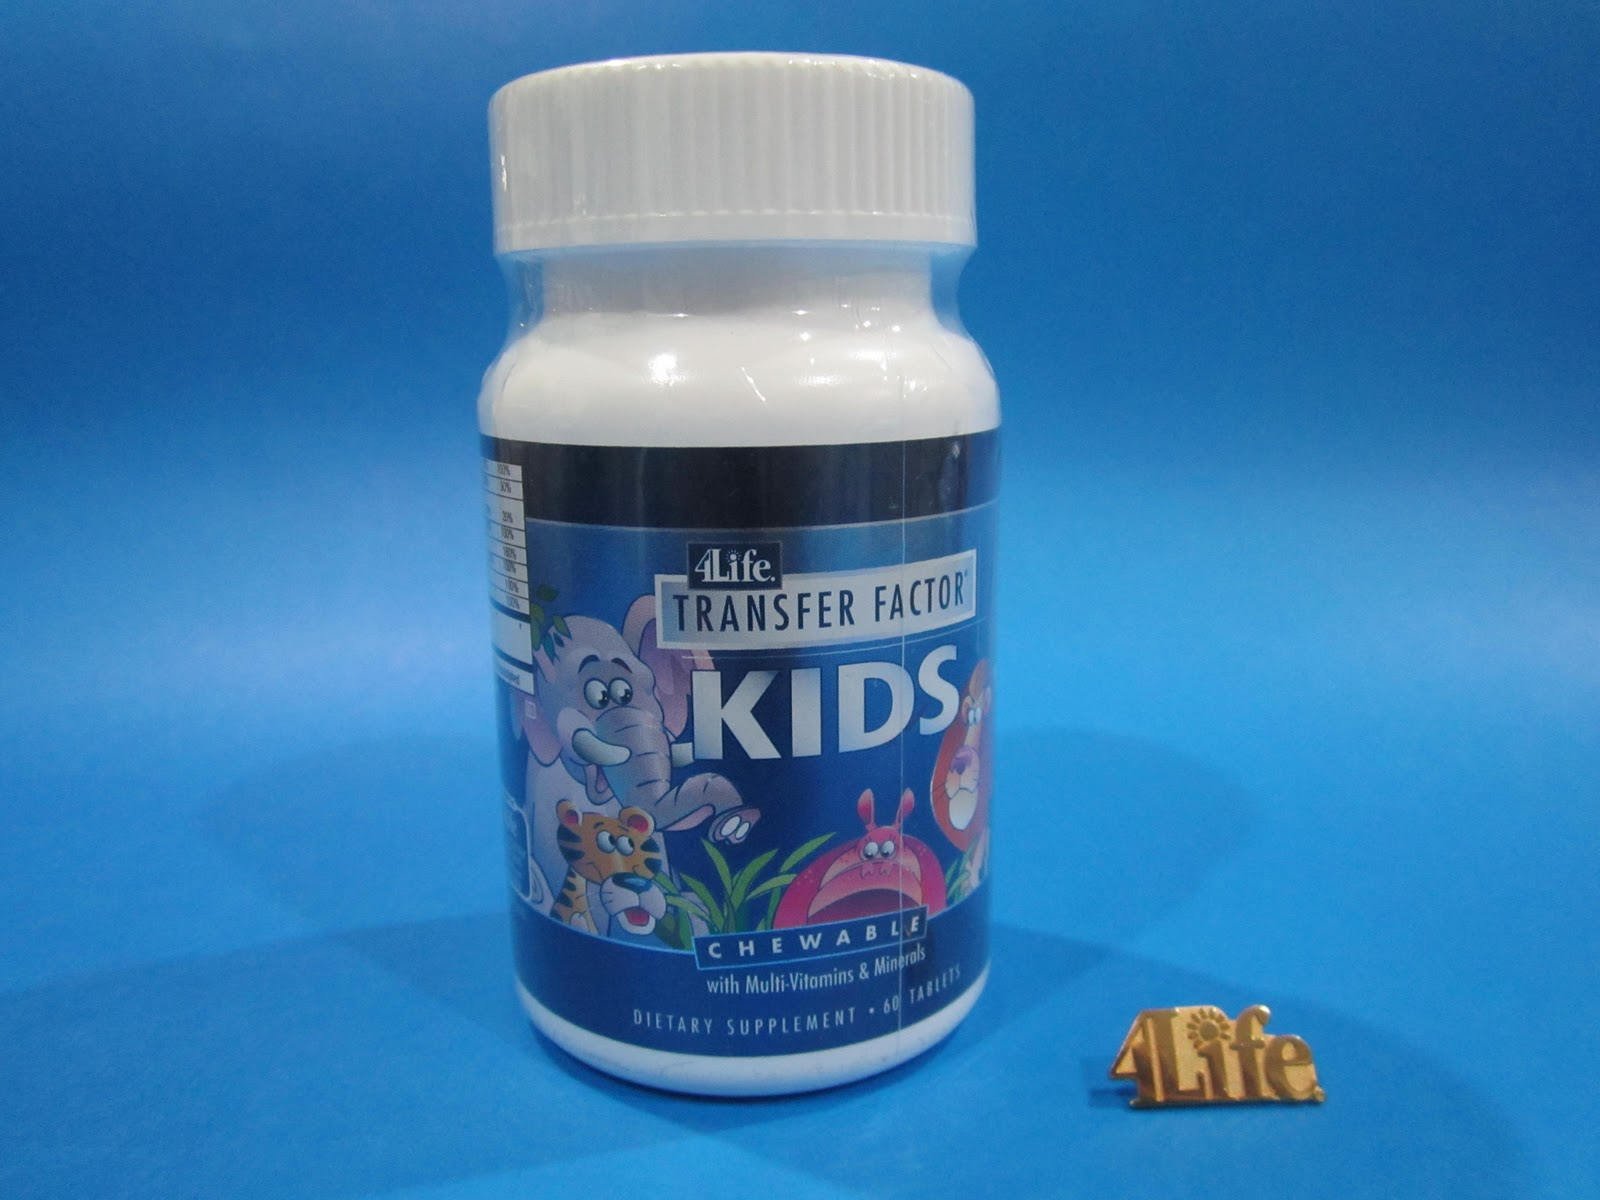 Investigaciones para la vida: 4LIFE TRANSFER FACTOR KIDS